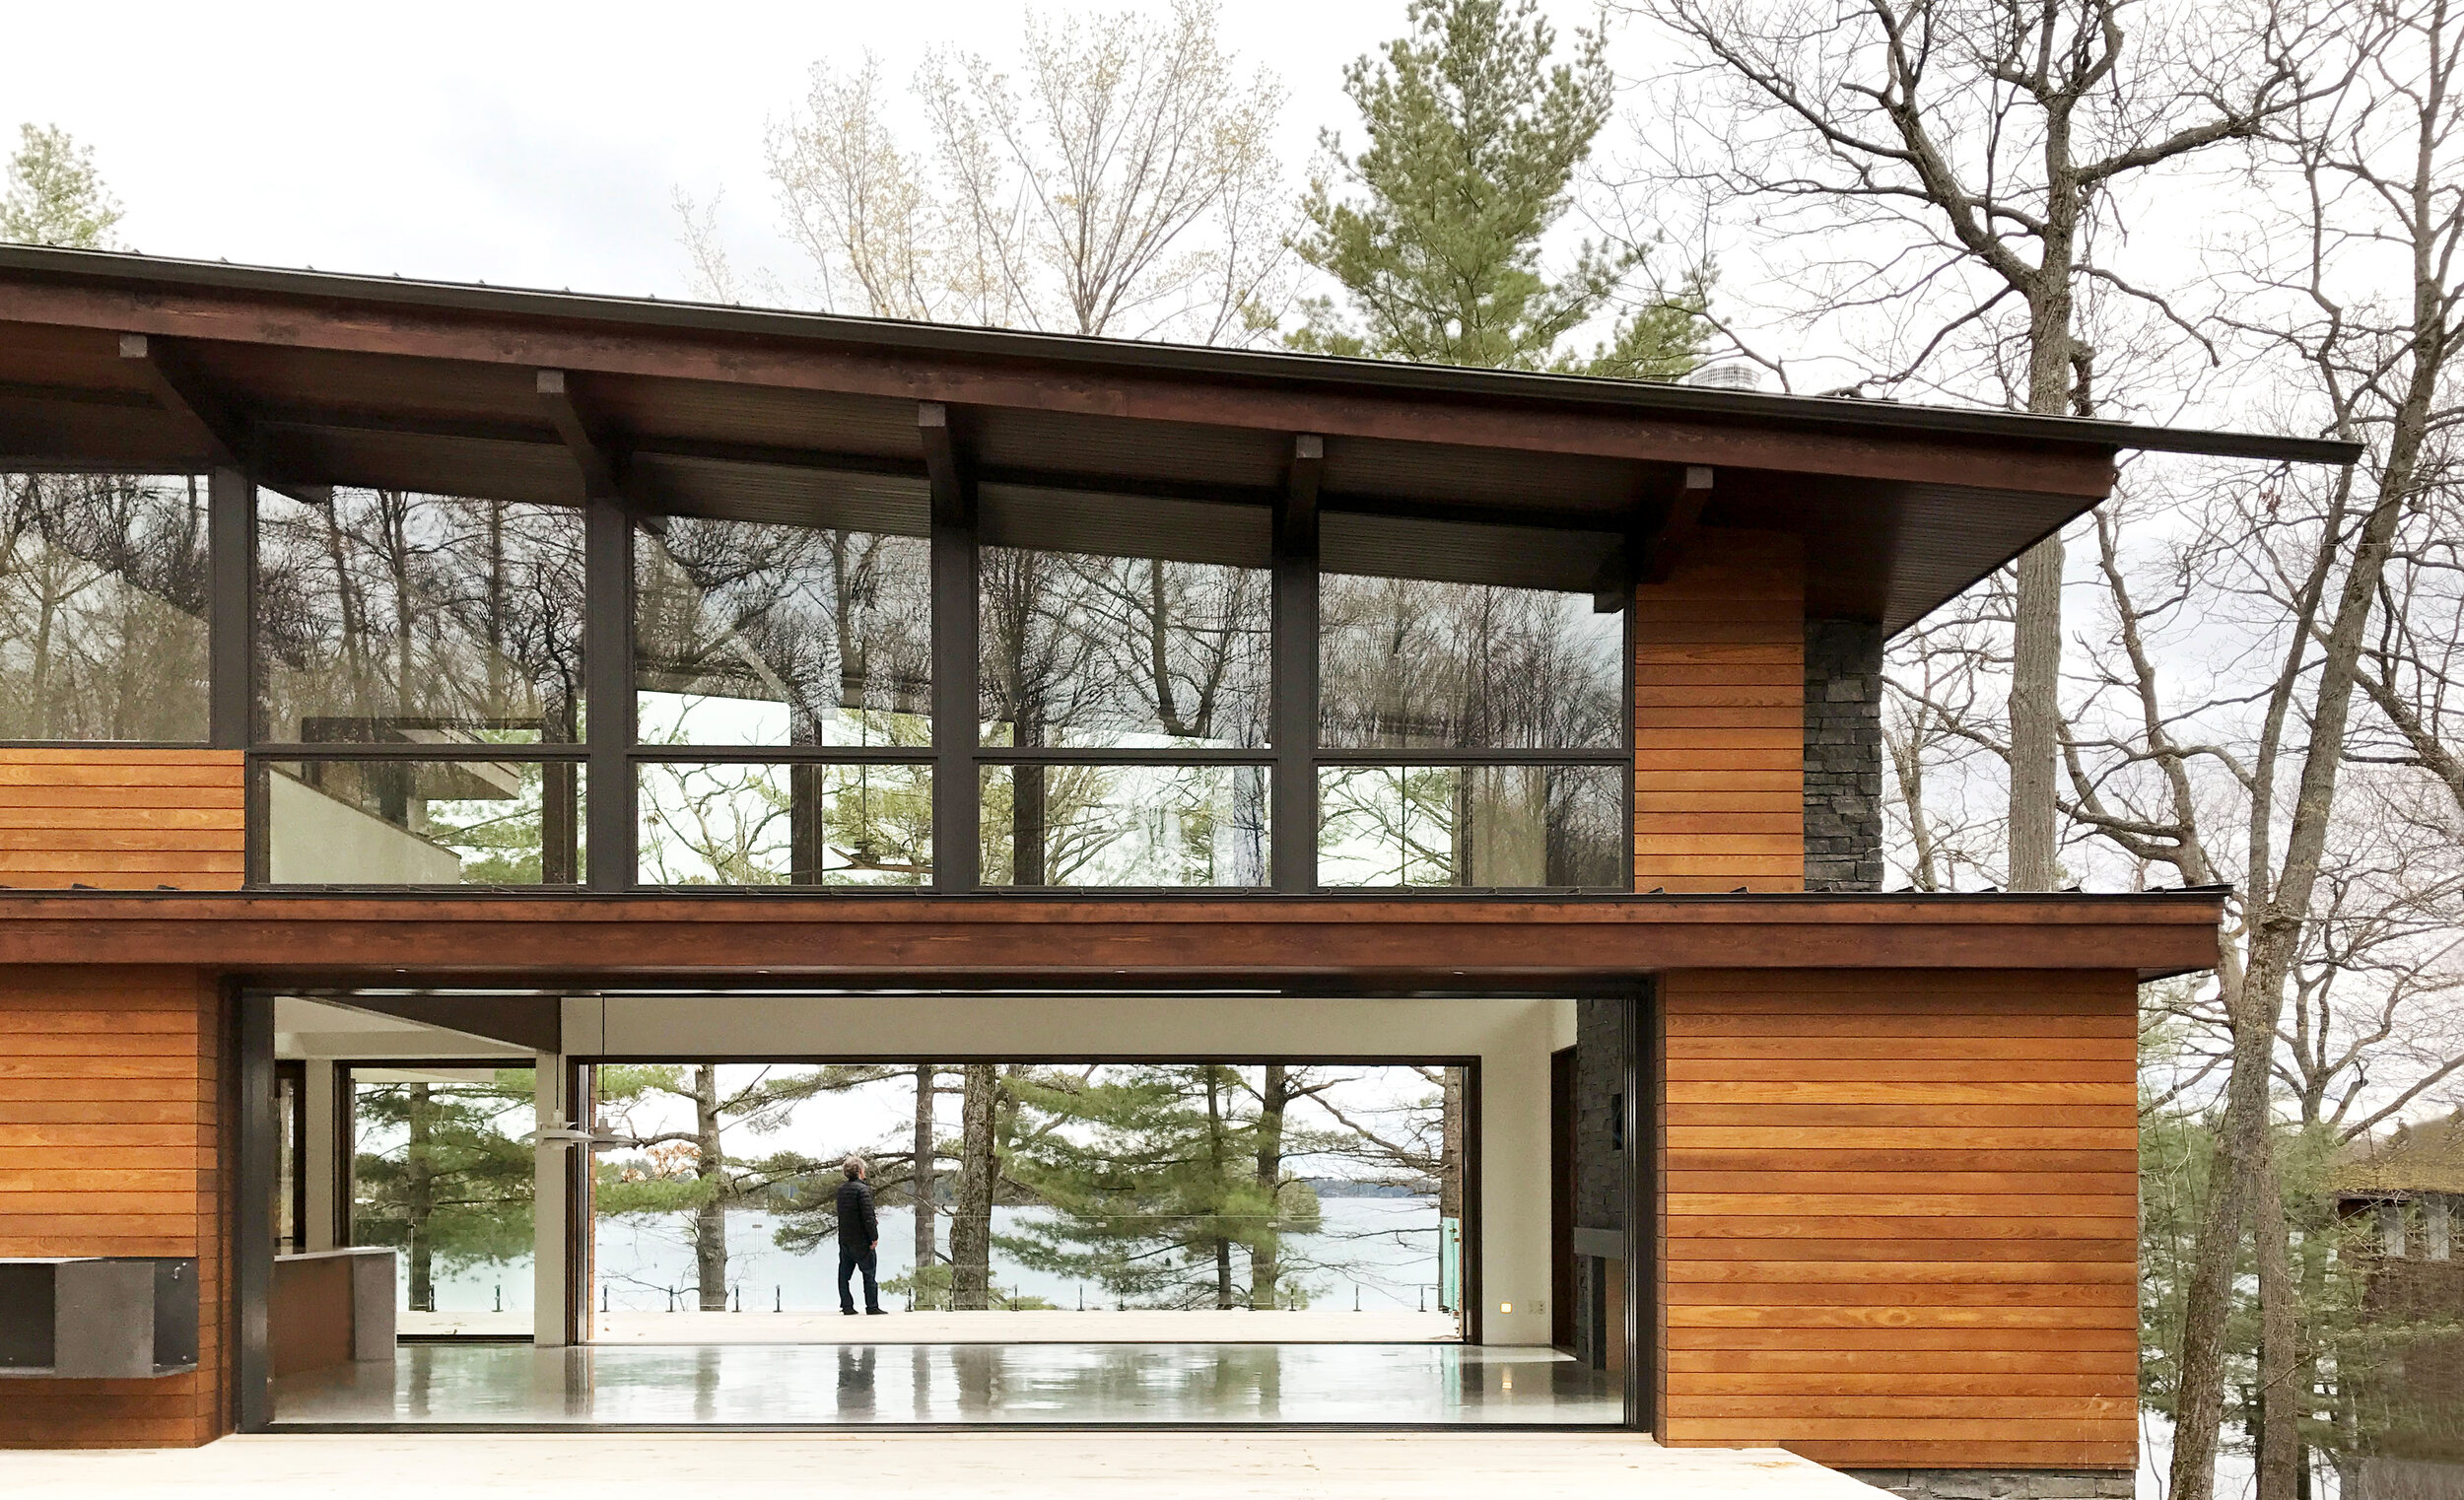 turkel_design_modern_prefab_home_muskoka_cottage_openhouse.jpg